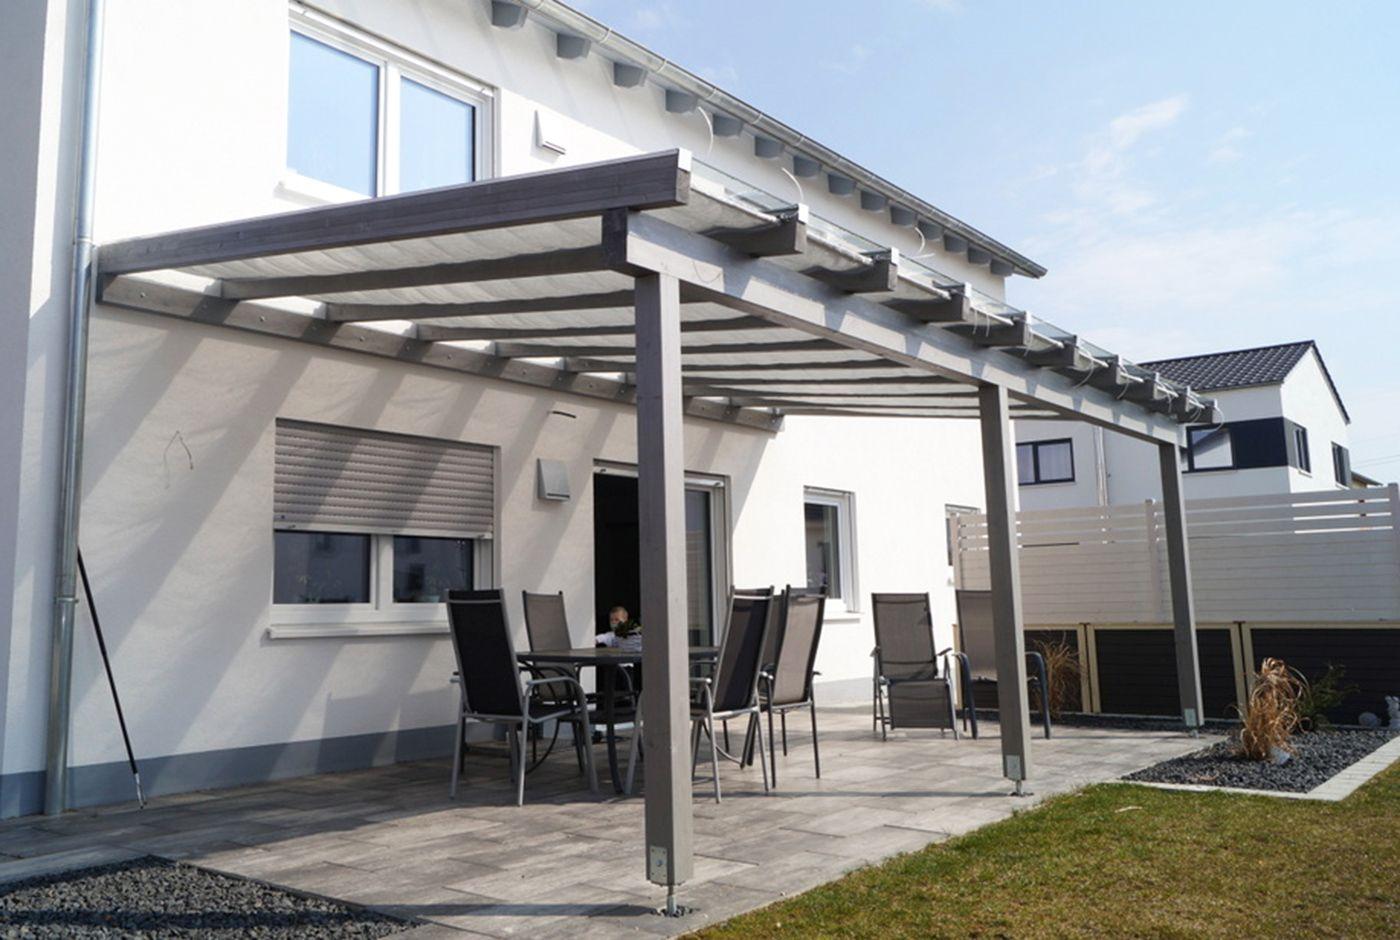 Terrassenuberdachung Wandanbau Aus Holz Online Bestellen Uberdachung Terrasse Terrasse Uberdachung Holz Terrassenuberdachung